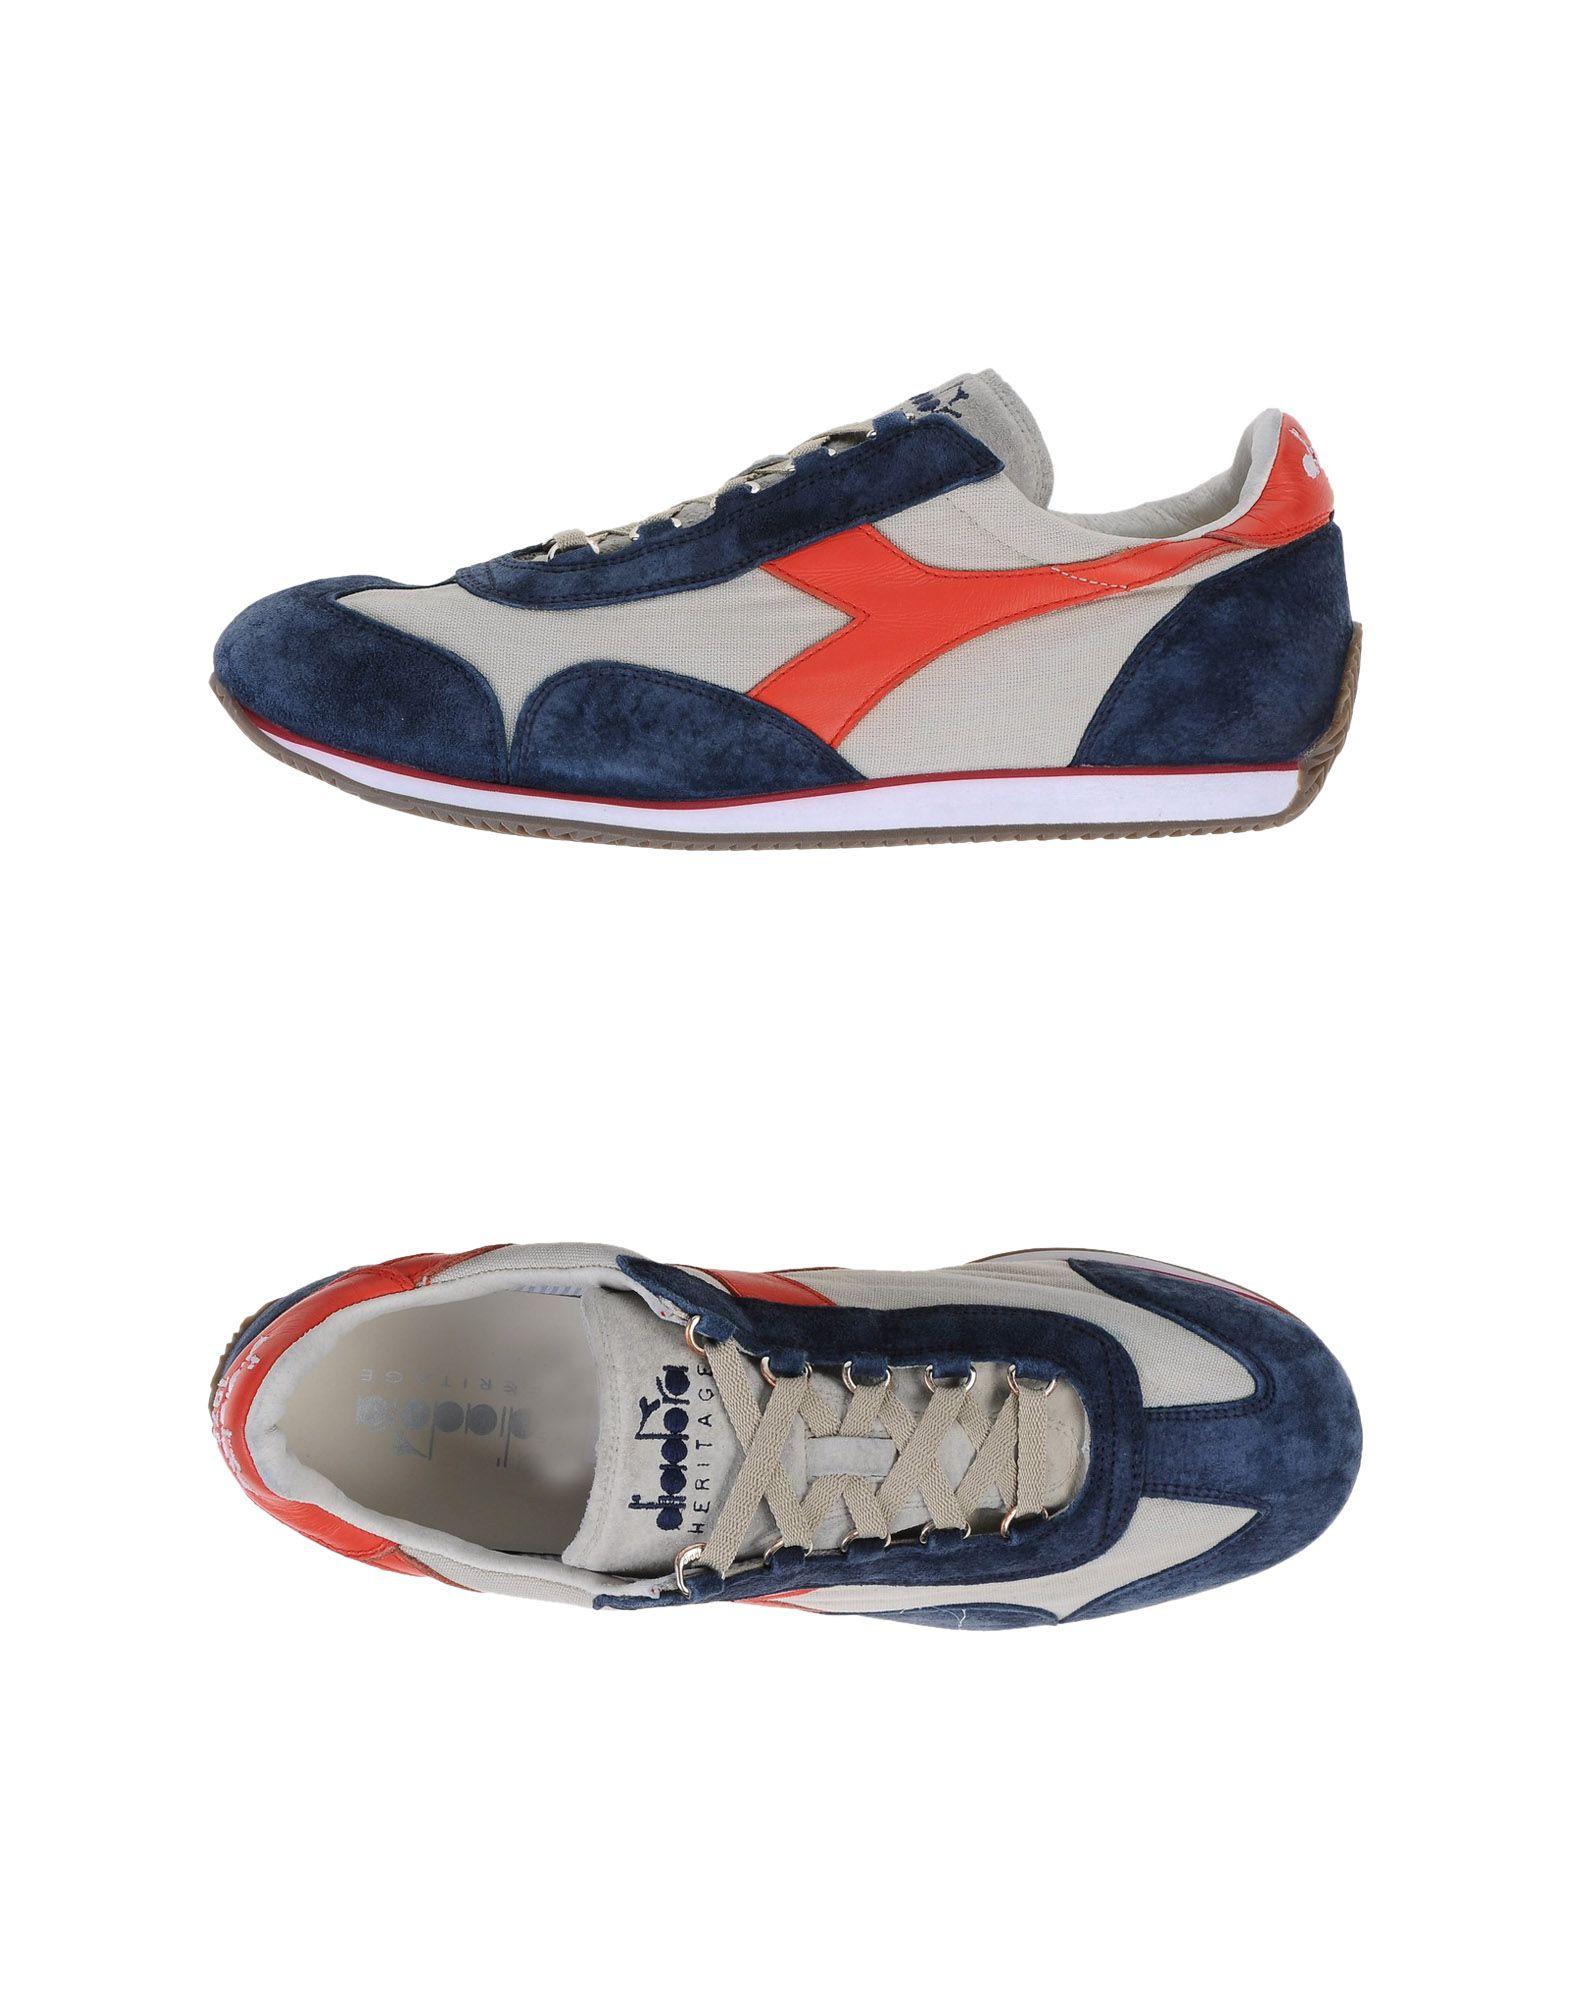 Sneakers Diadora Heritage Uomo Equipe Stone Wash 12 - Uomo Heritage - 44810189OF 91fbbe